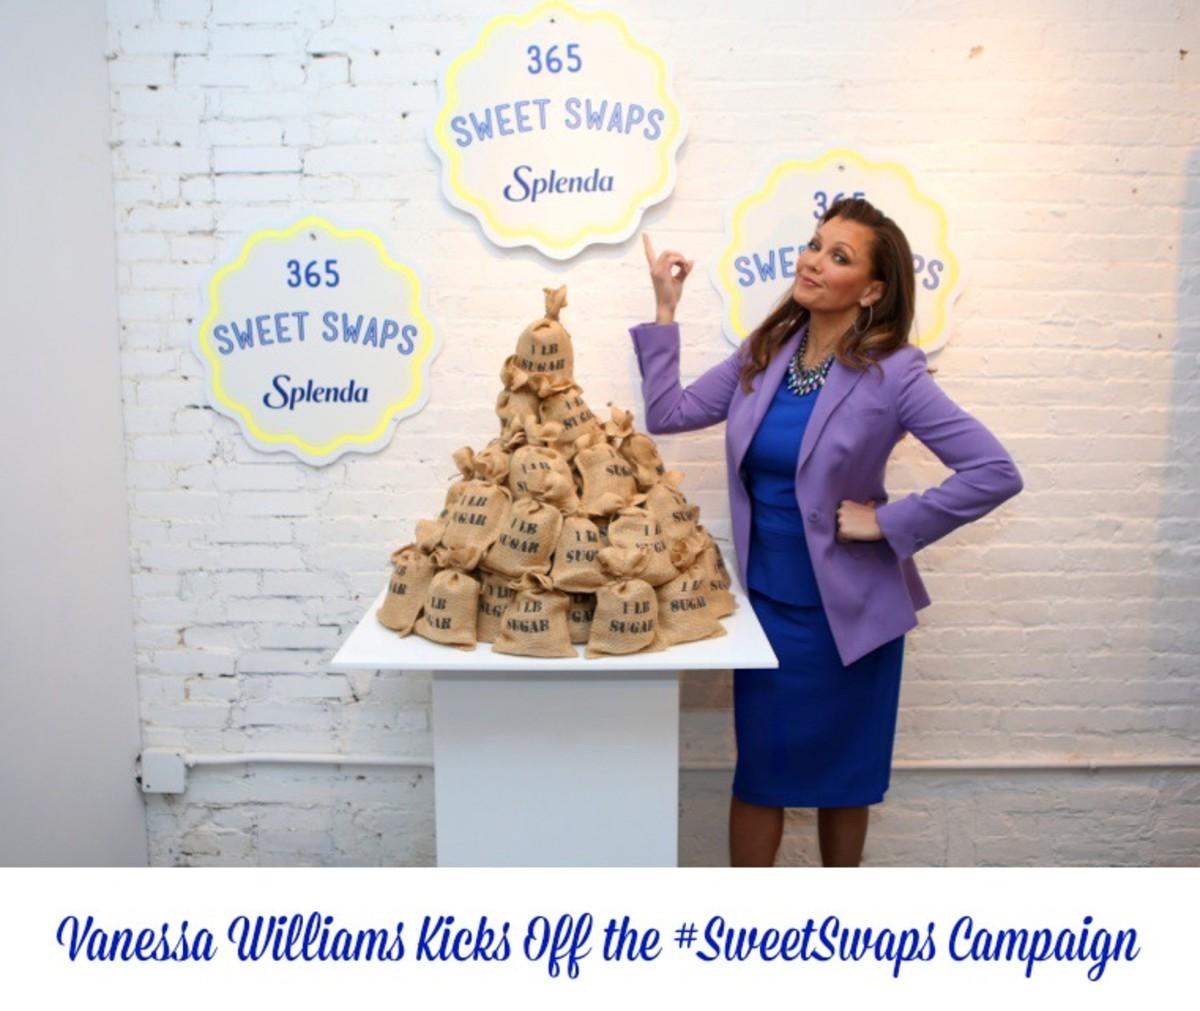 Vanessa Williams Kicks off #SweetSwaps Campaign.jpg